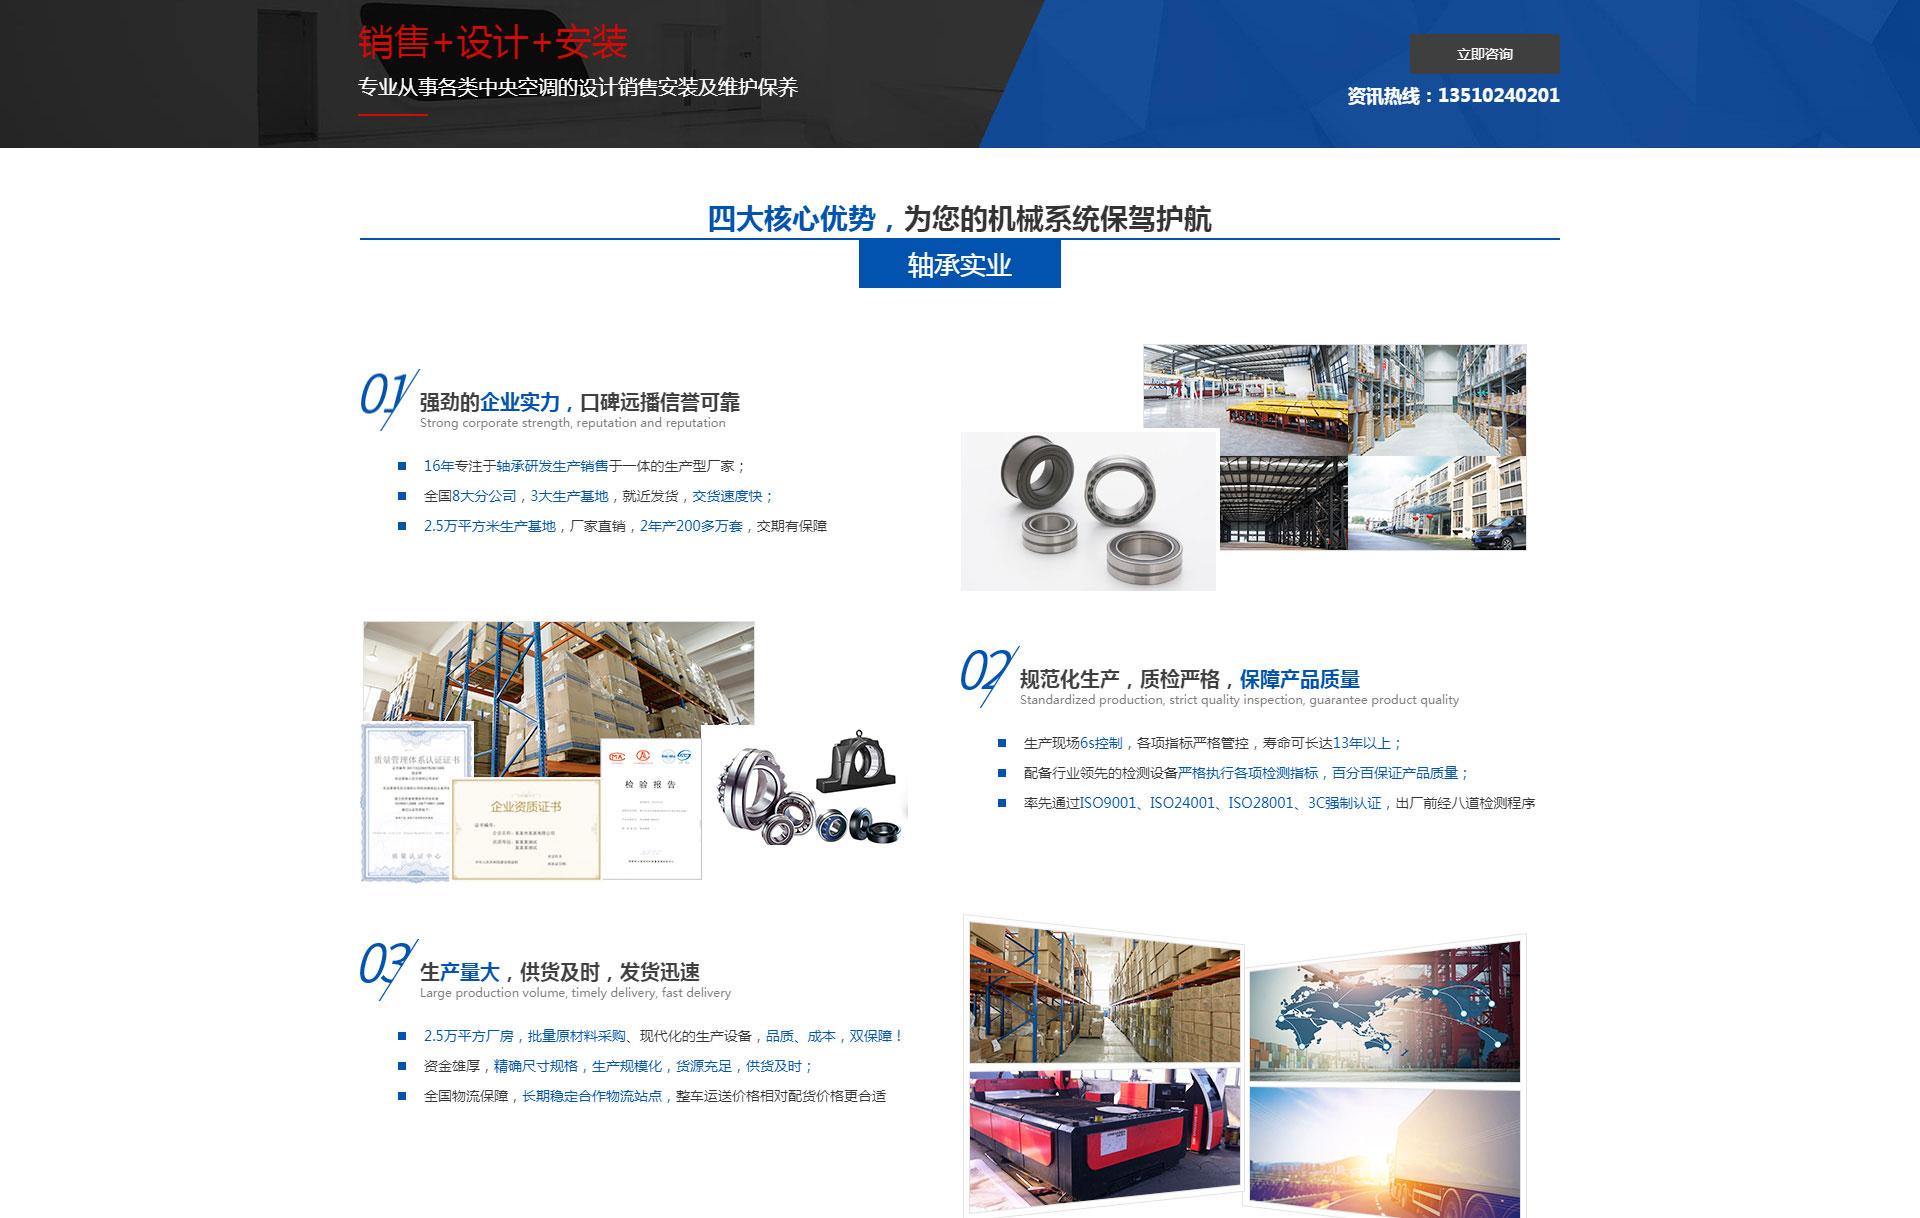 iBlueProResponsive蓝色响应式Phpcms企业网站模板